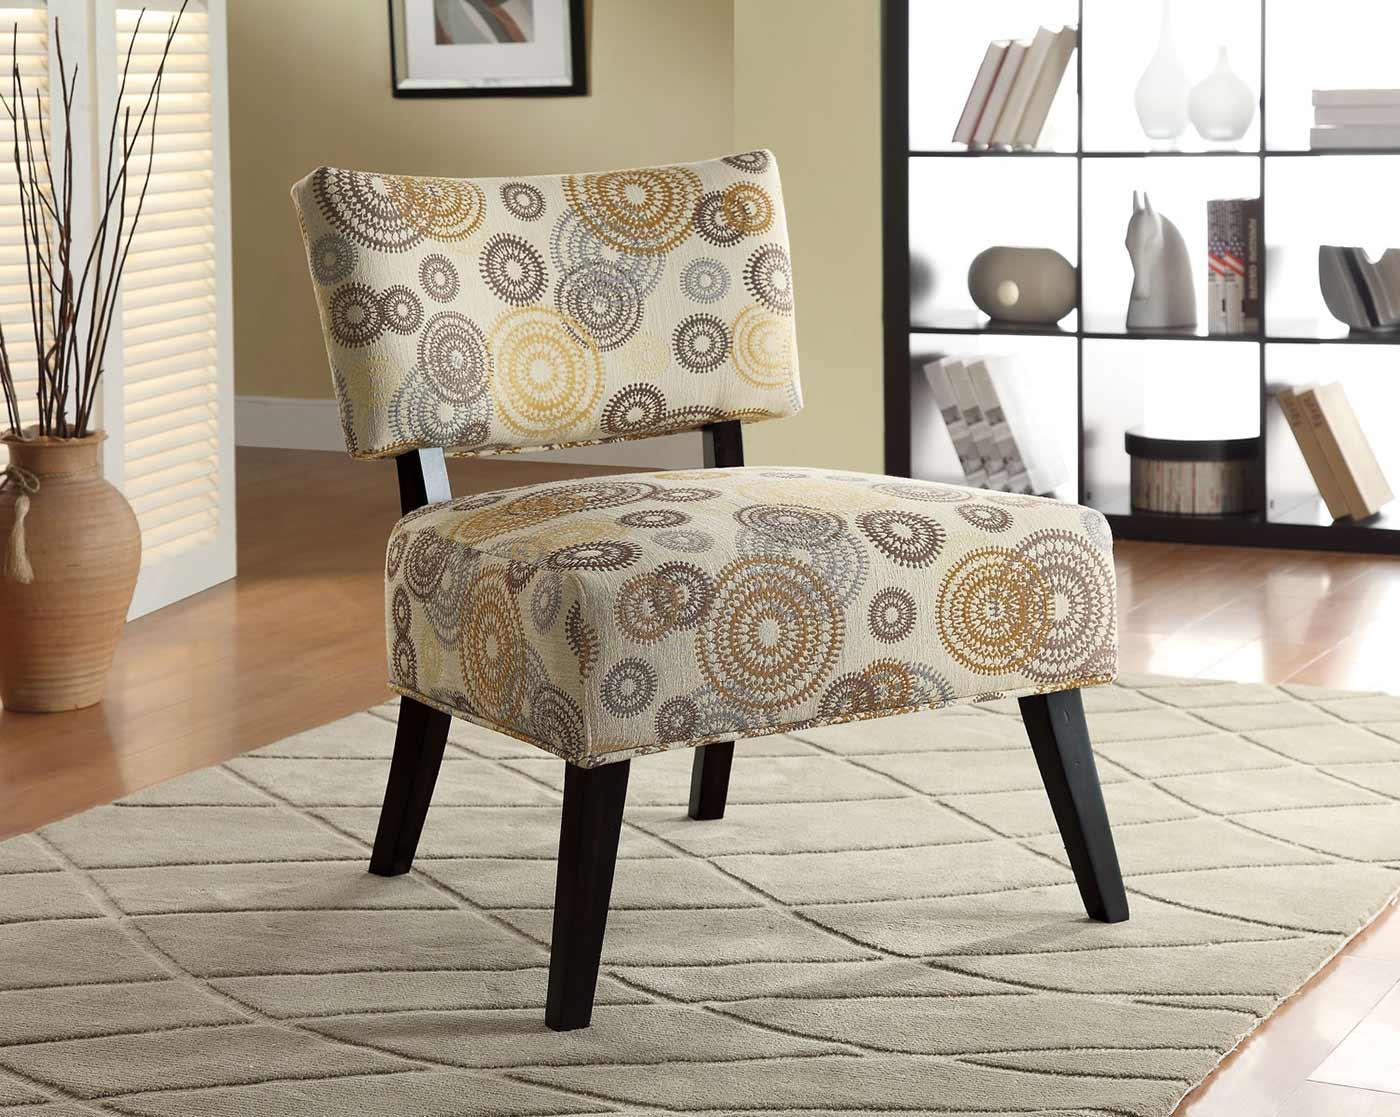 Coaster 902116 Accent Chair - Beige